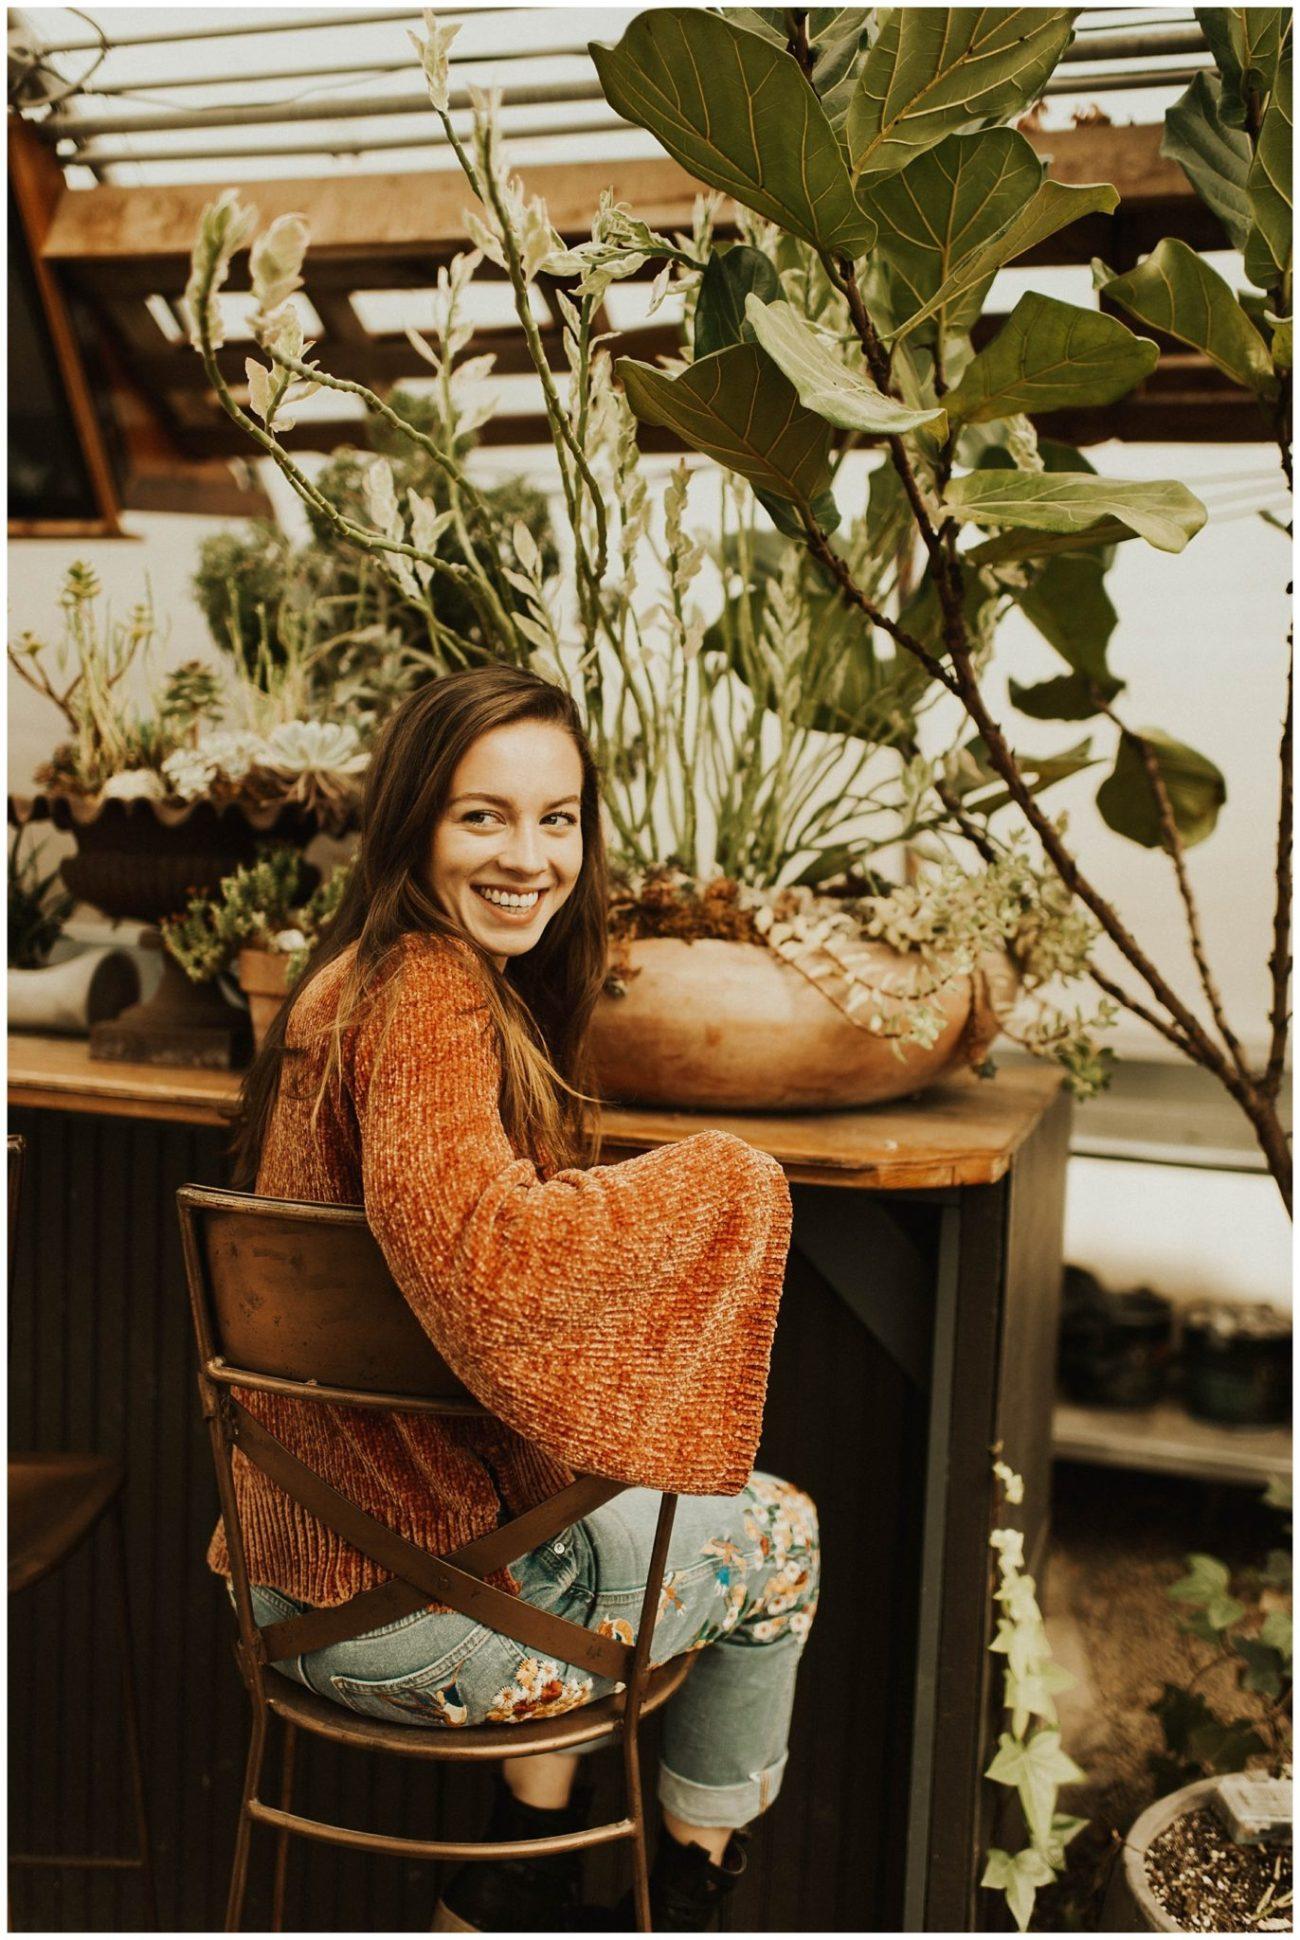 Sabrina    Candid Portraits – Lauren F.otography ddd1d1b2f5a